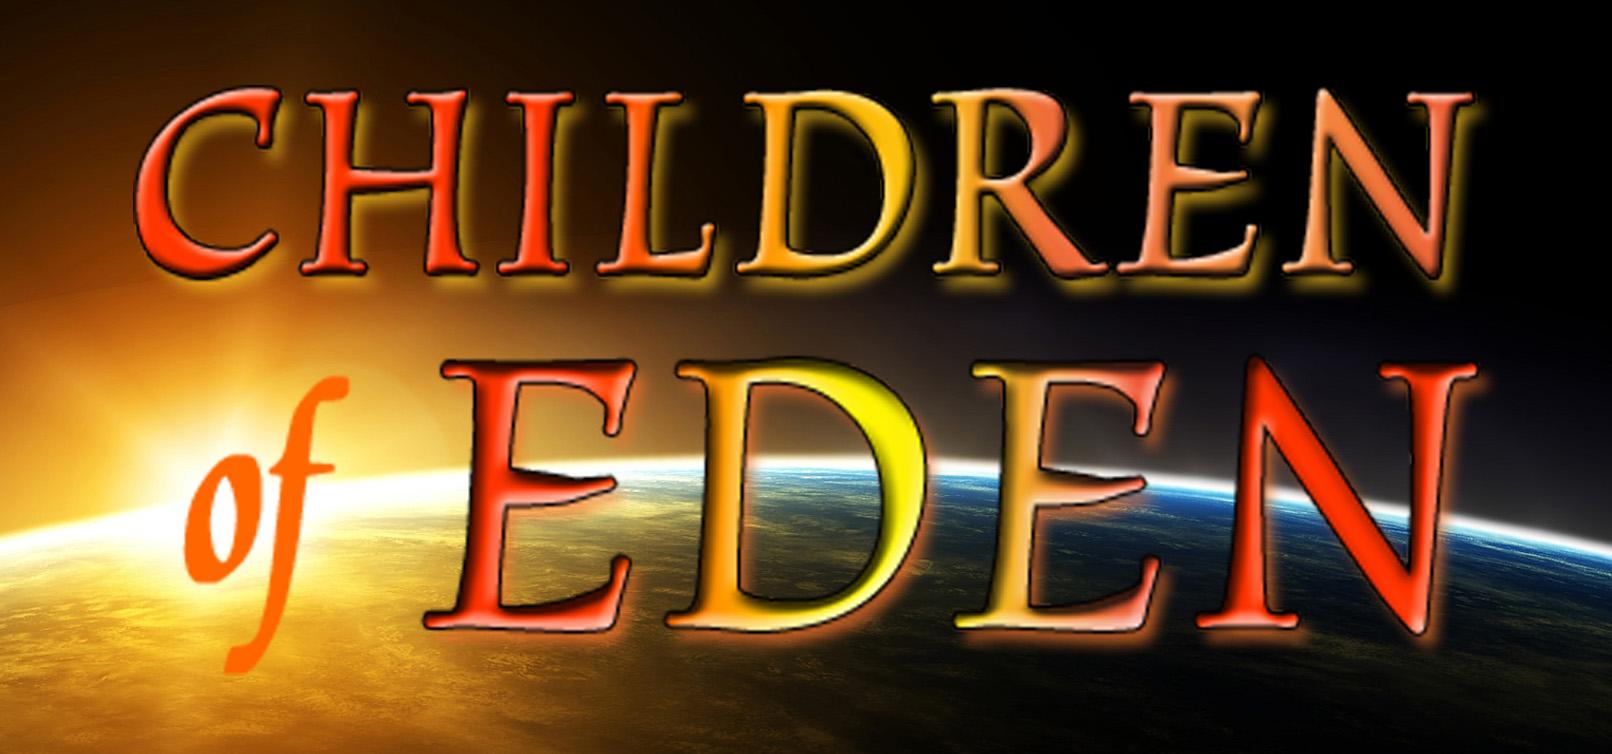 SMASH Children of Eden logo 6A